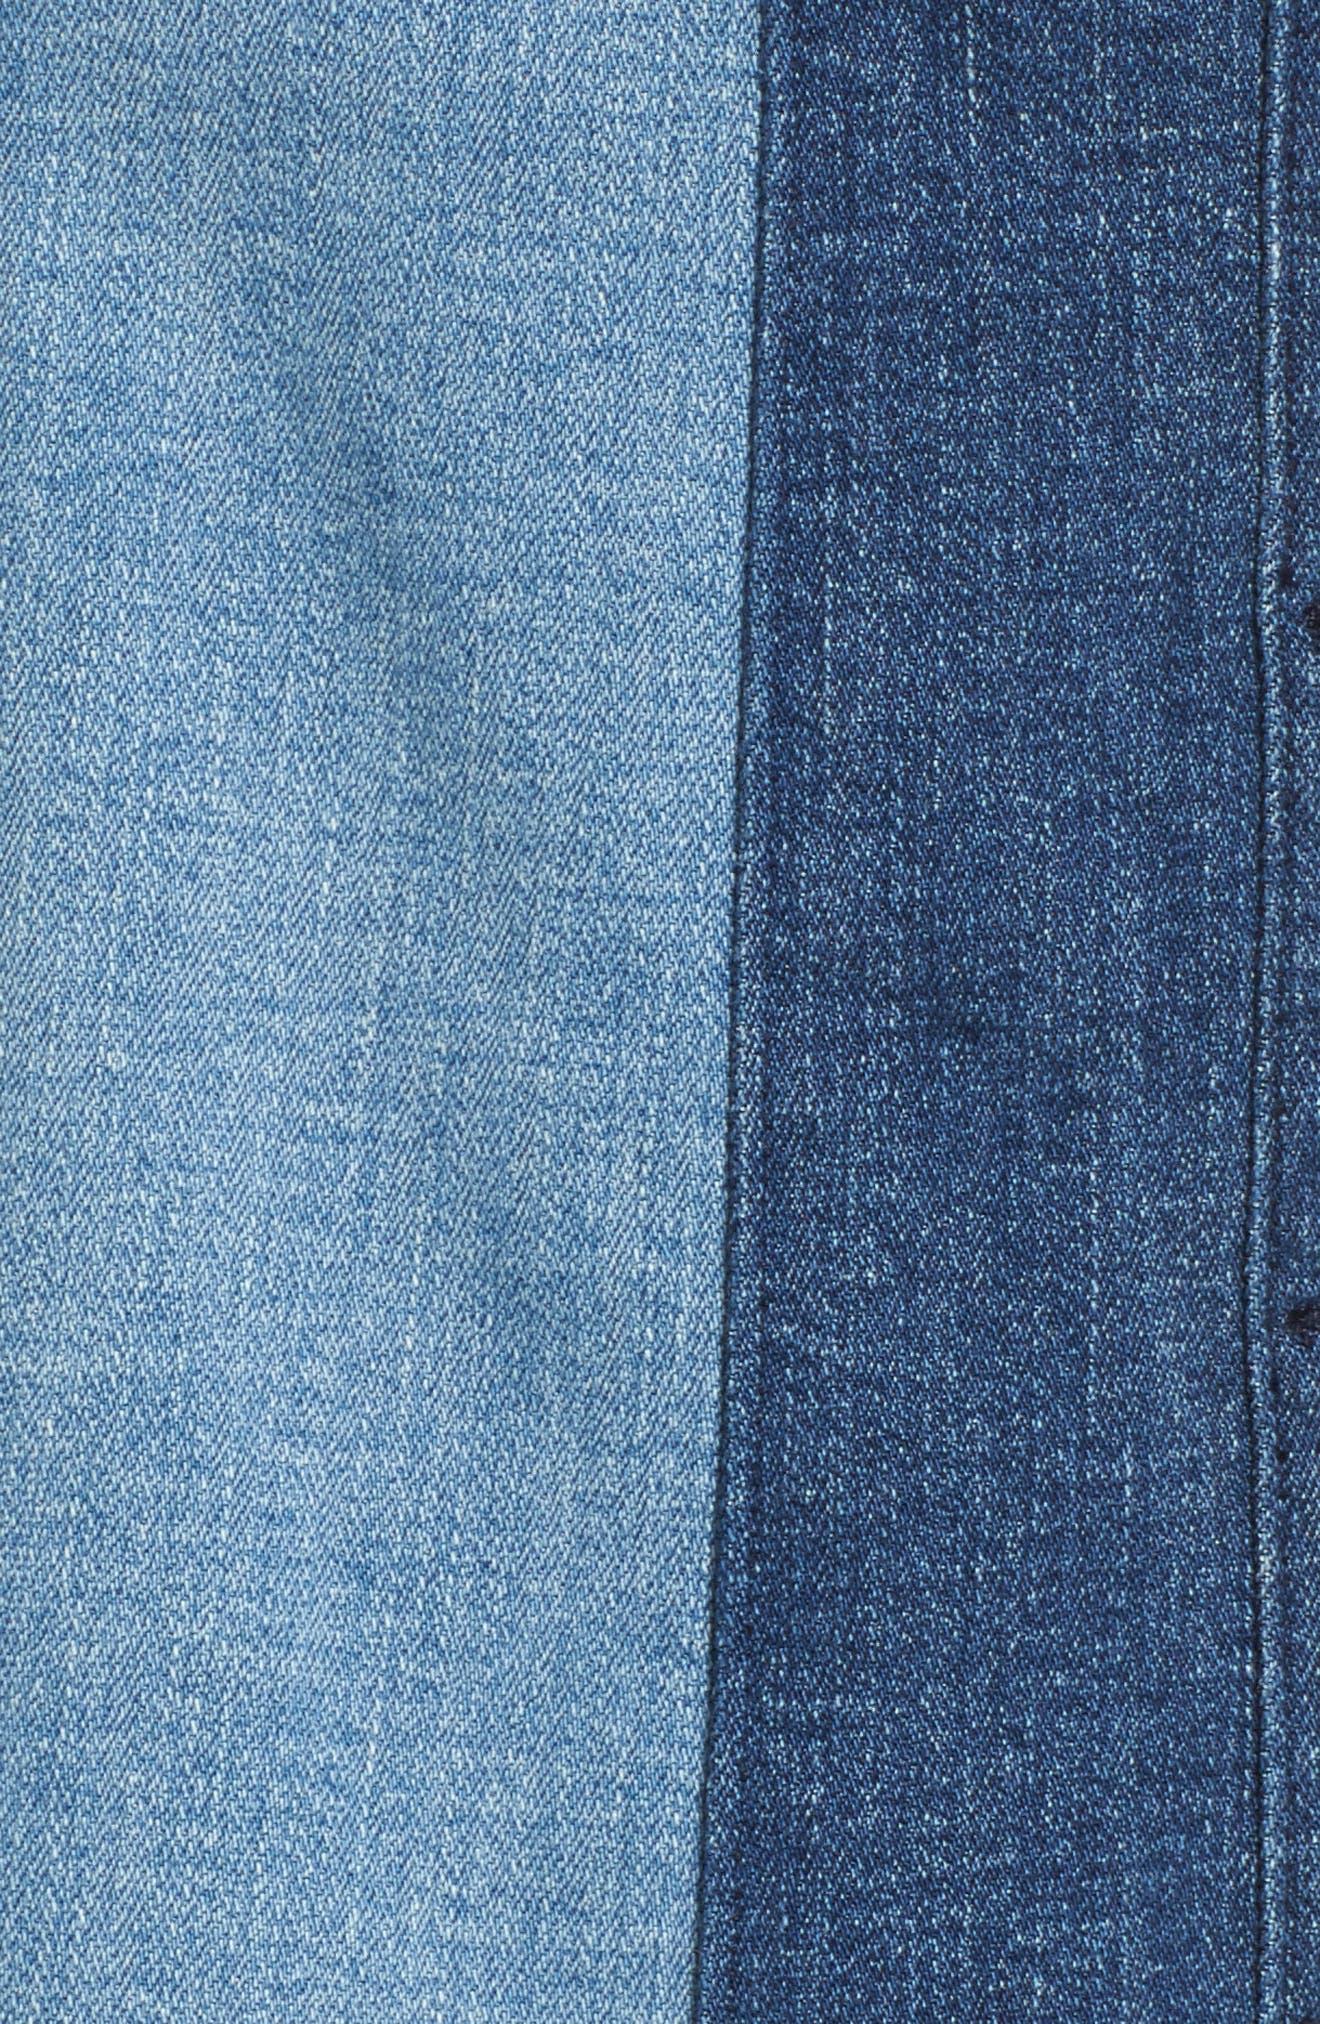 Beatty Denim Miniskirt,                             Alternate thumbnail 5, color,                             408